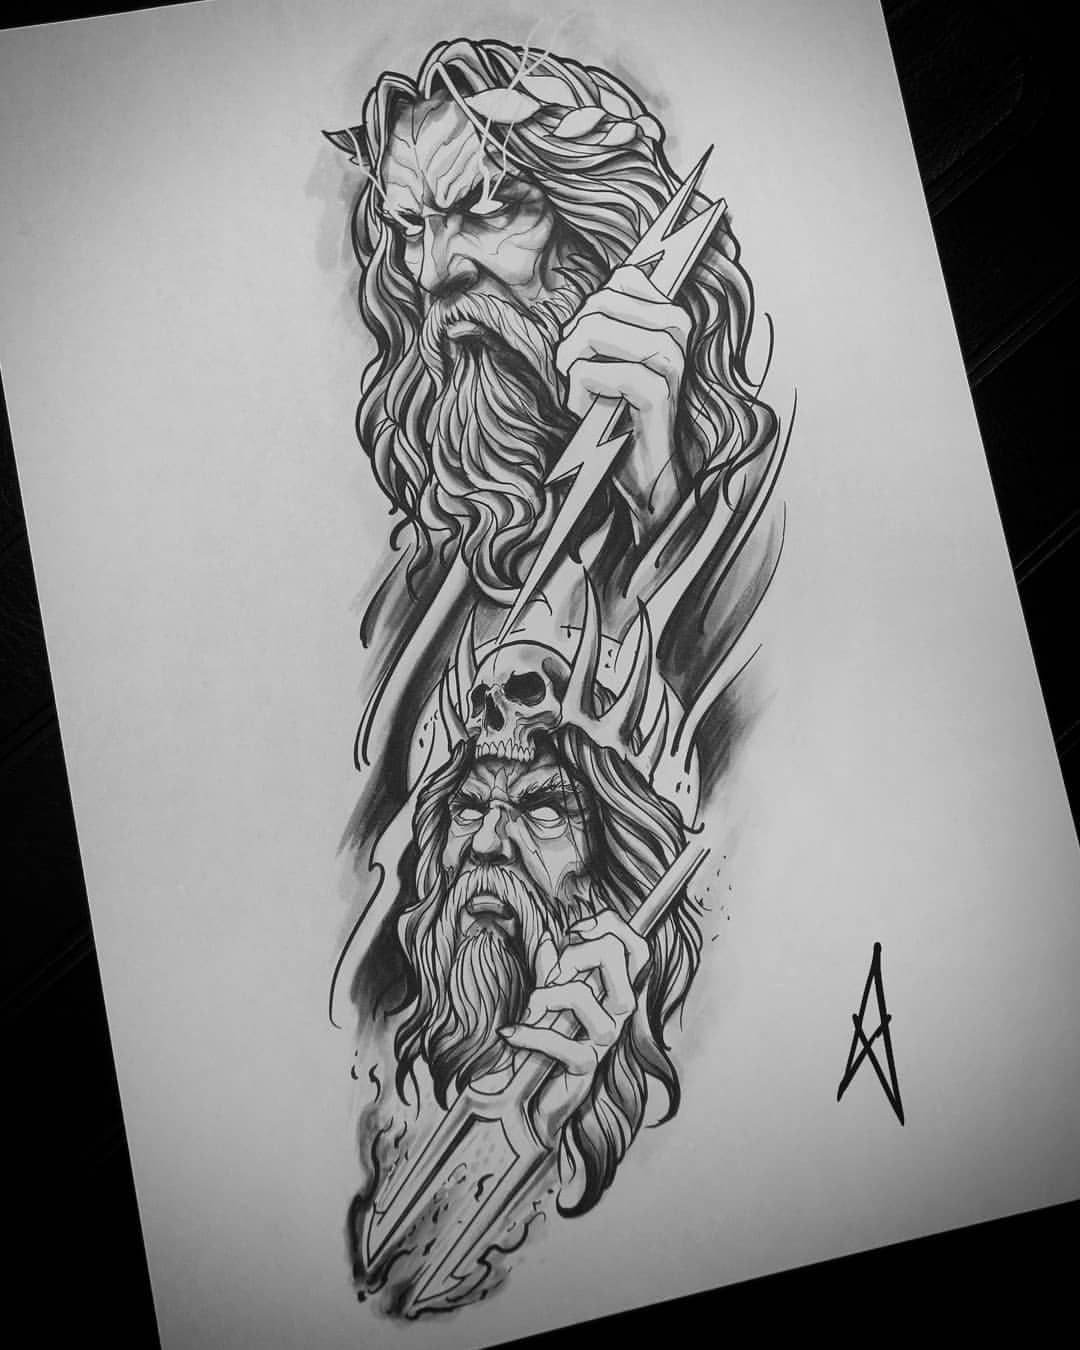 Longsleeve Sketch Zeus Hades Blackworkerssubmission Blackworkers Tattoo Illustrativetattoo Tatuagens De Mitologia Tatuagem Grega Tatuagem Da Mitologia Grega